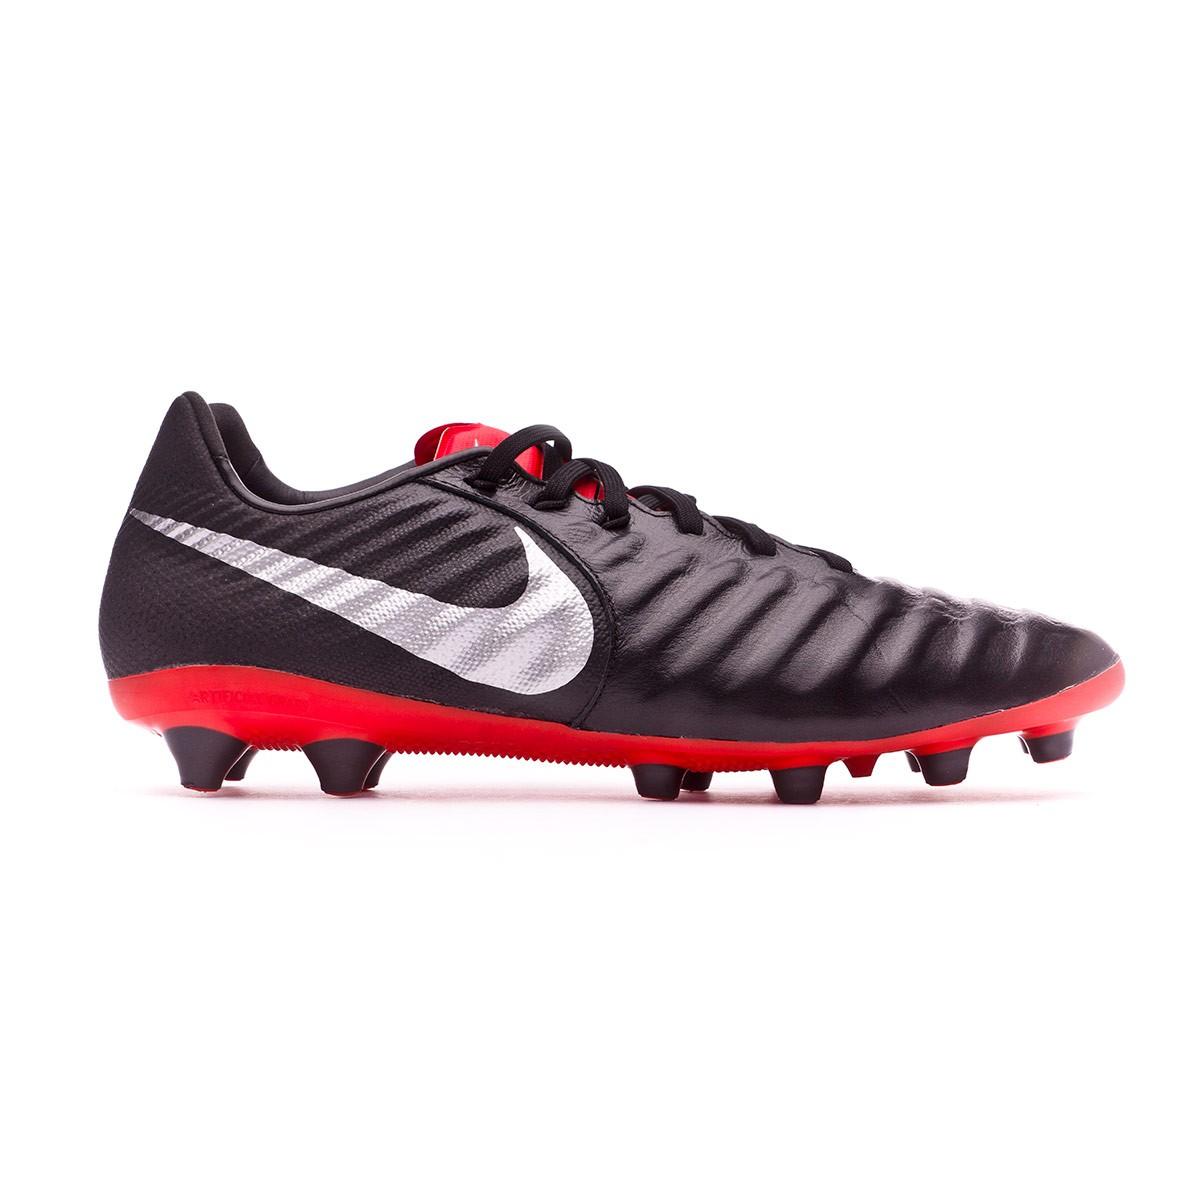 new products 74752 2b176 Football Boots Nike Tiempo Legend VII Pro AG-Pro Black-Metallic silver-Light  crimson - Tienda de fútbol Fútbol Emotion